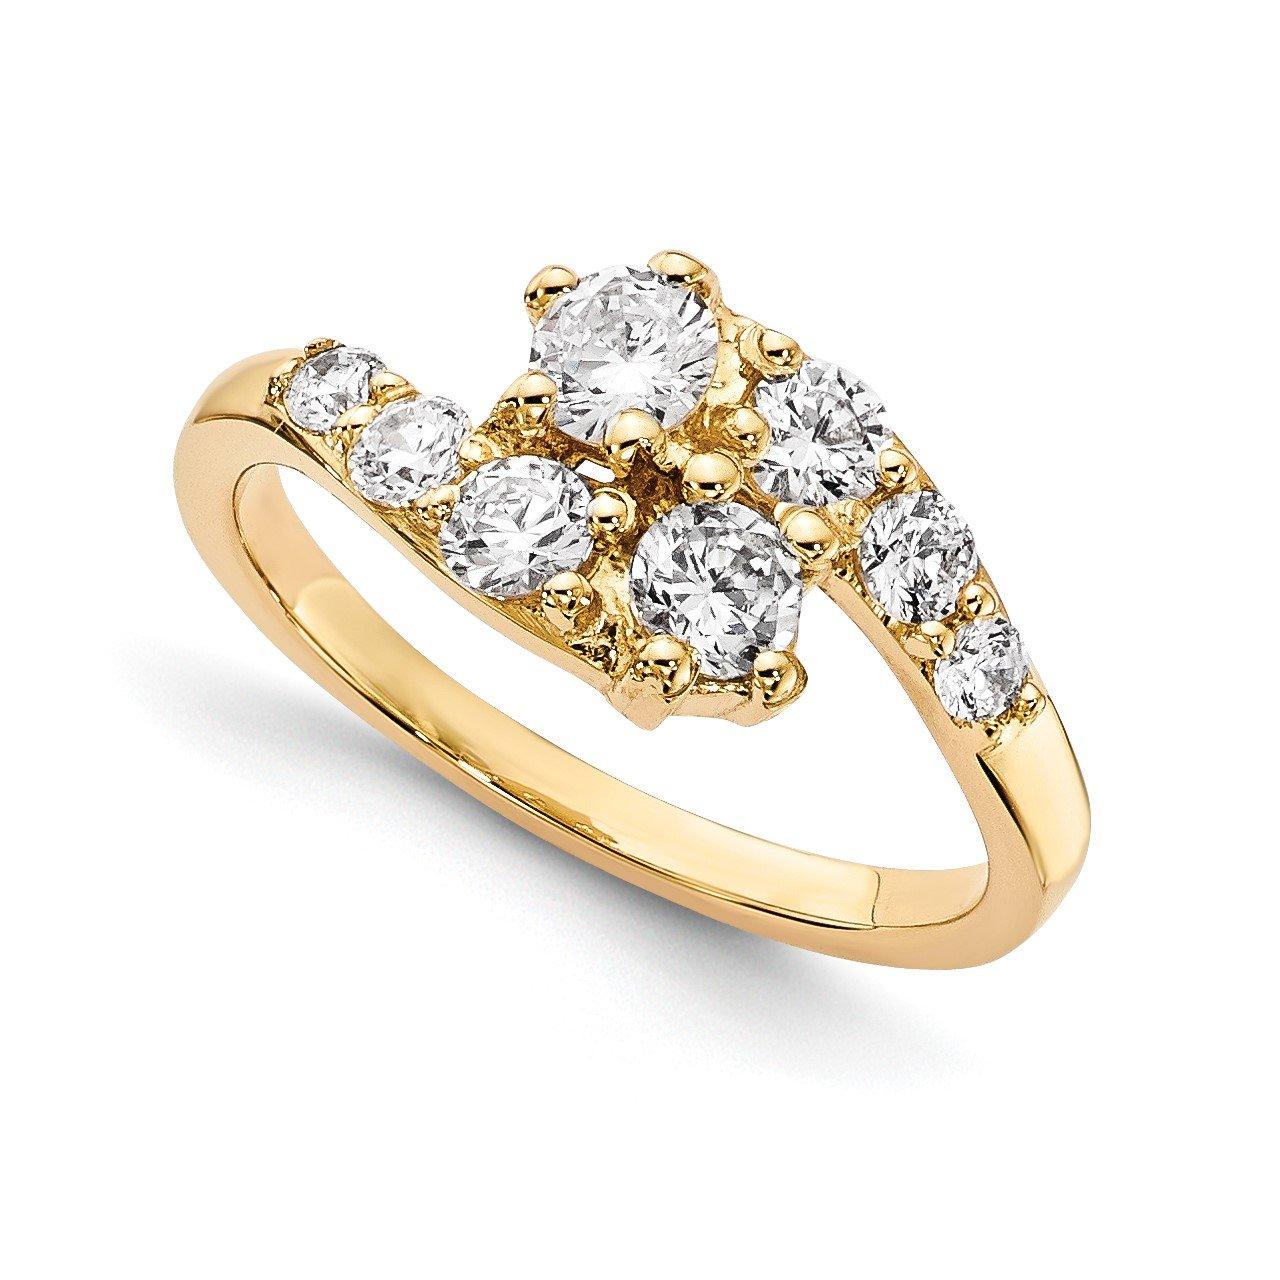 14KY A Diamond 2-stone Ring Semi-Mount - 2.6 mm center stones